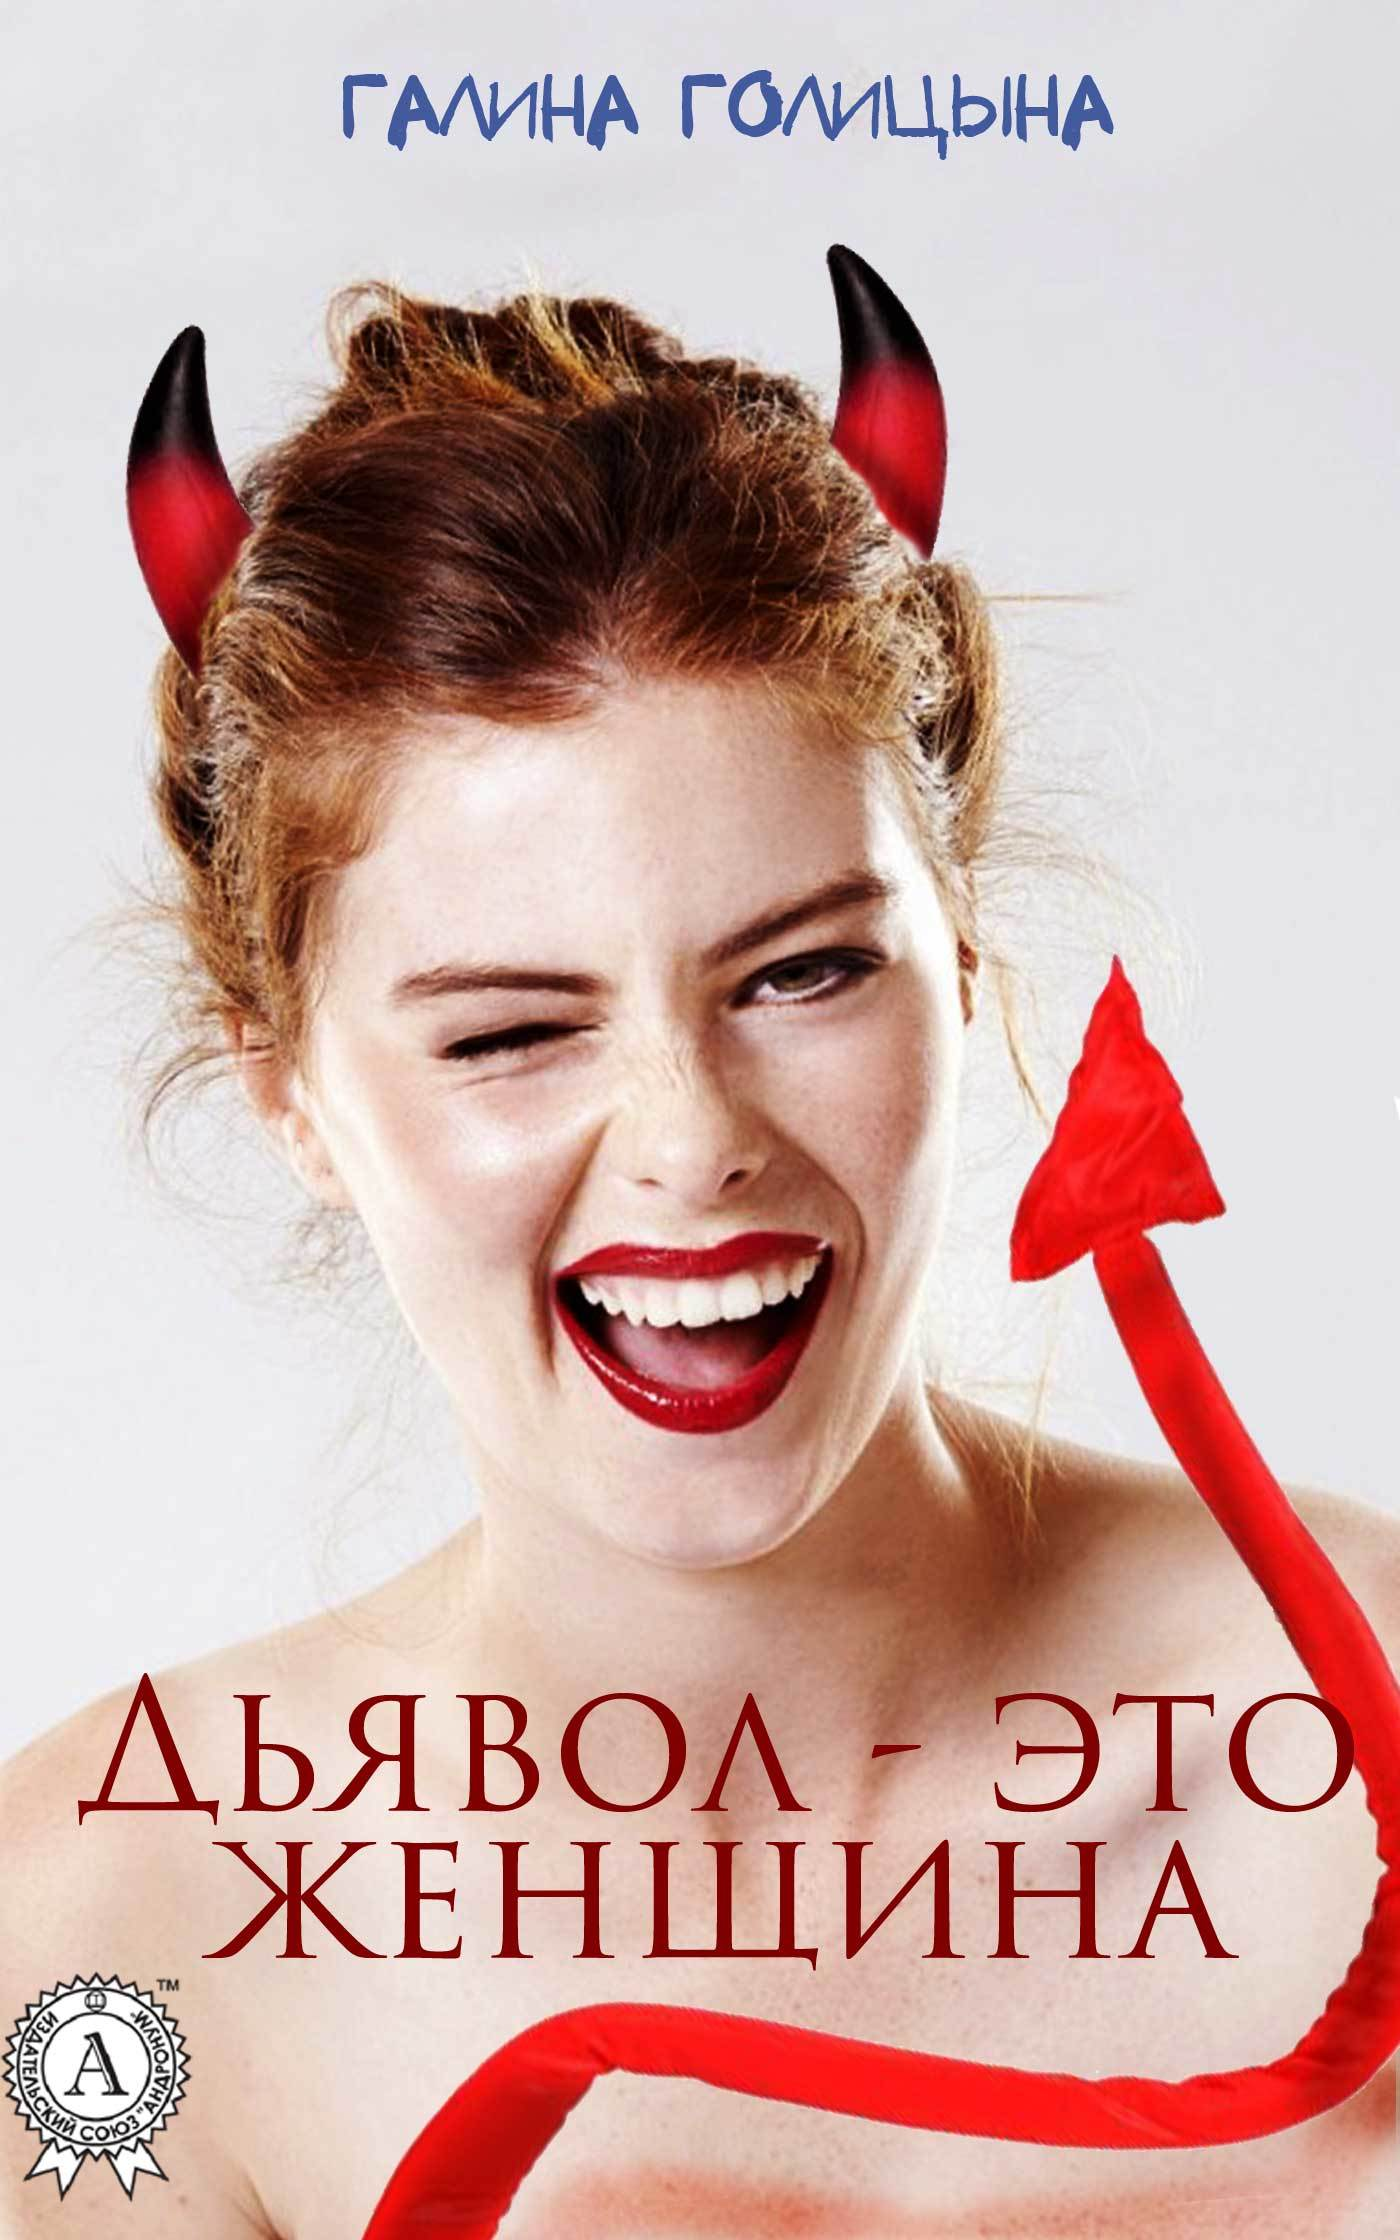 Галина Голицына Дьявол – это женщина галина голицына бомж миллионер